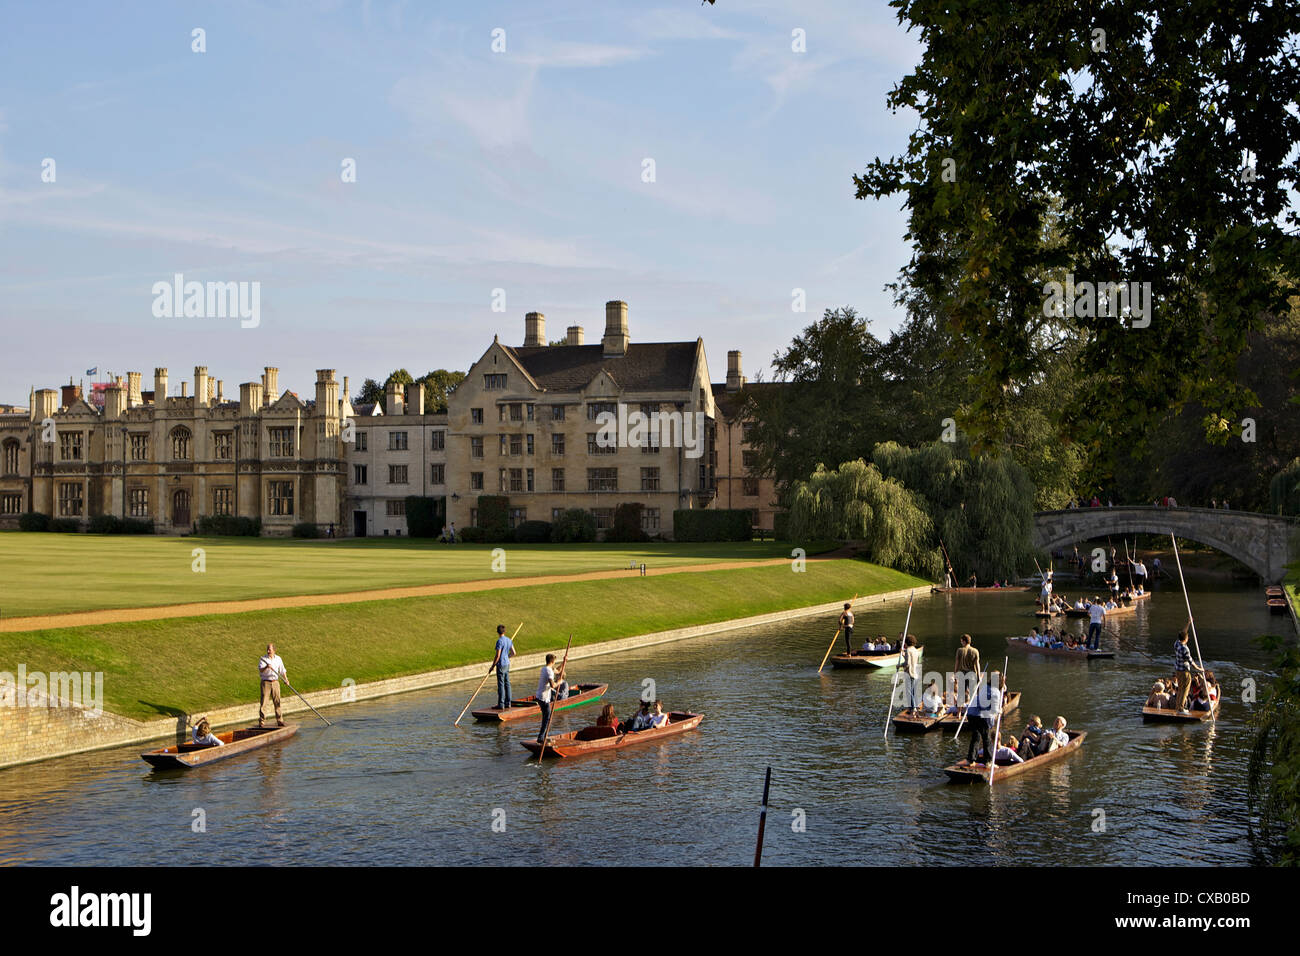 Punting on The Backs, River Cam, Clare College, Cambridge, Cambridgeshire, England, United Kingdom, Europe - Stock Image